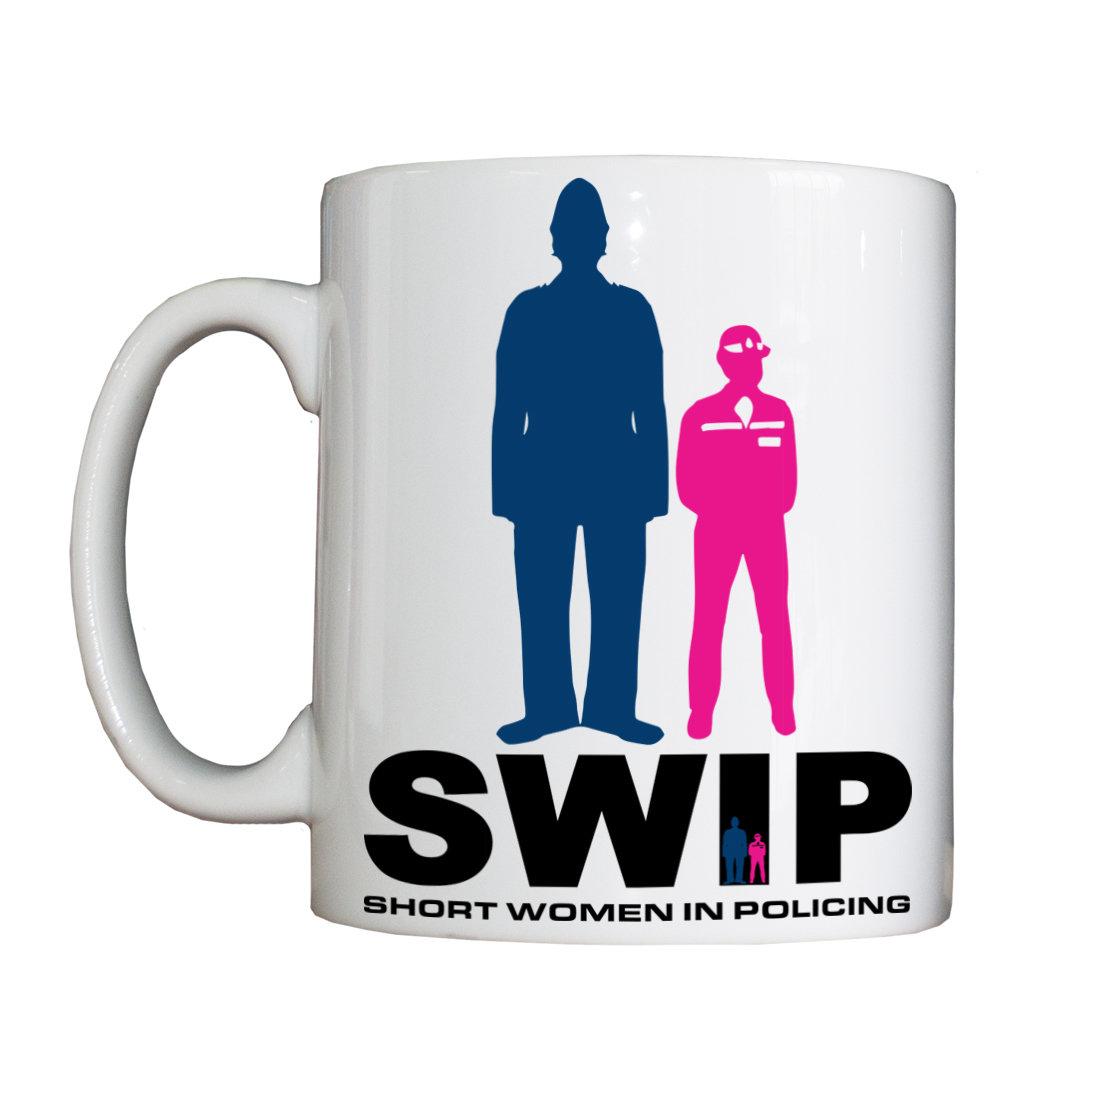 Personalised 'SWIP' Drinking Vessel SWIPVesselBirds